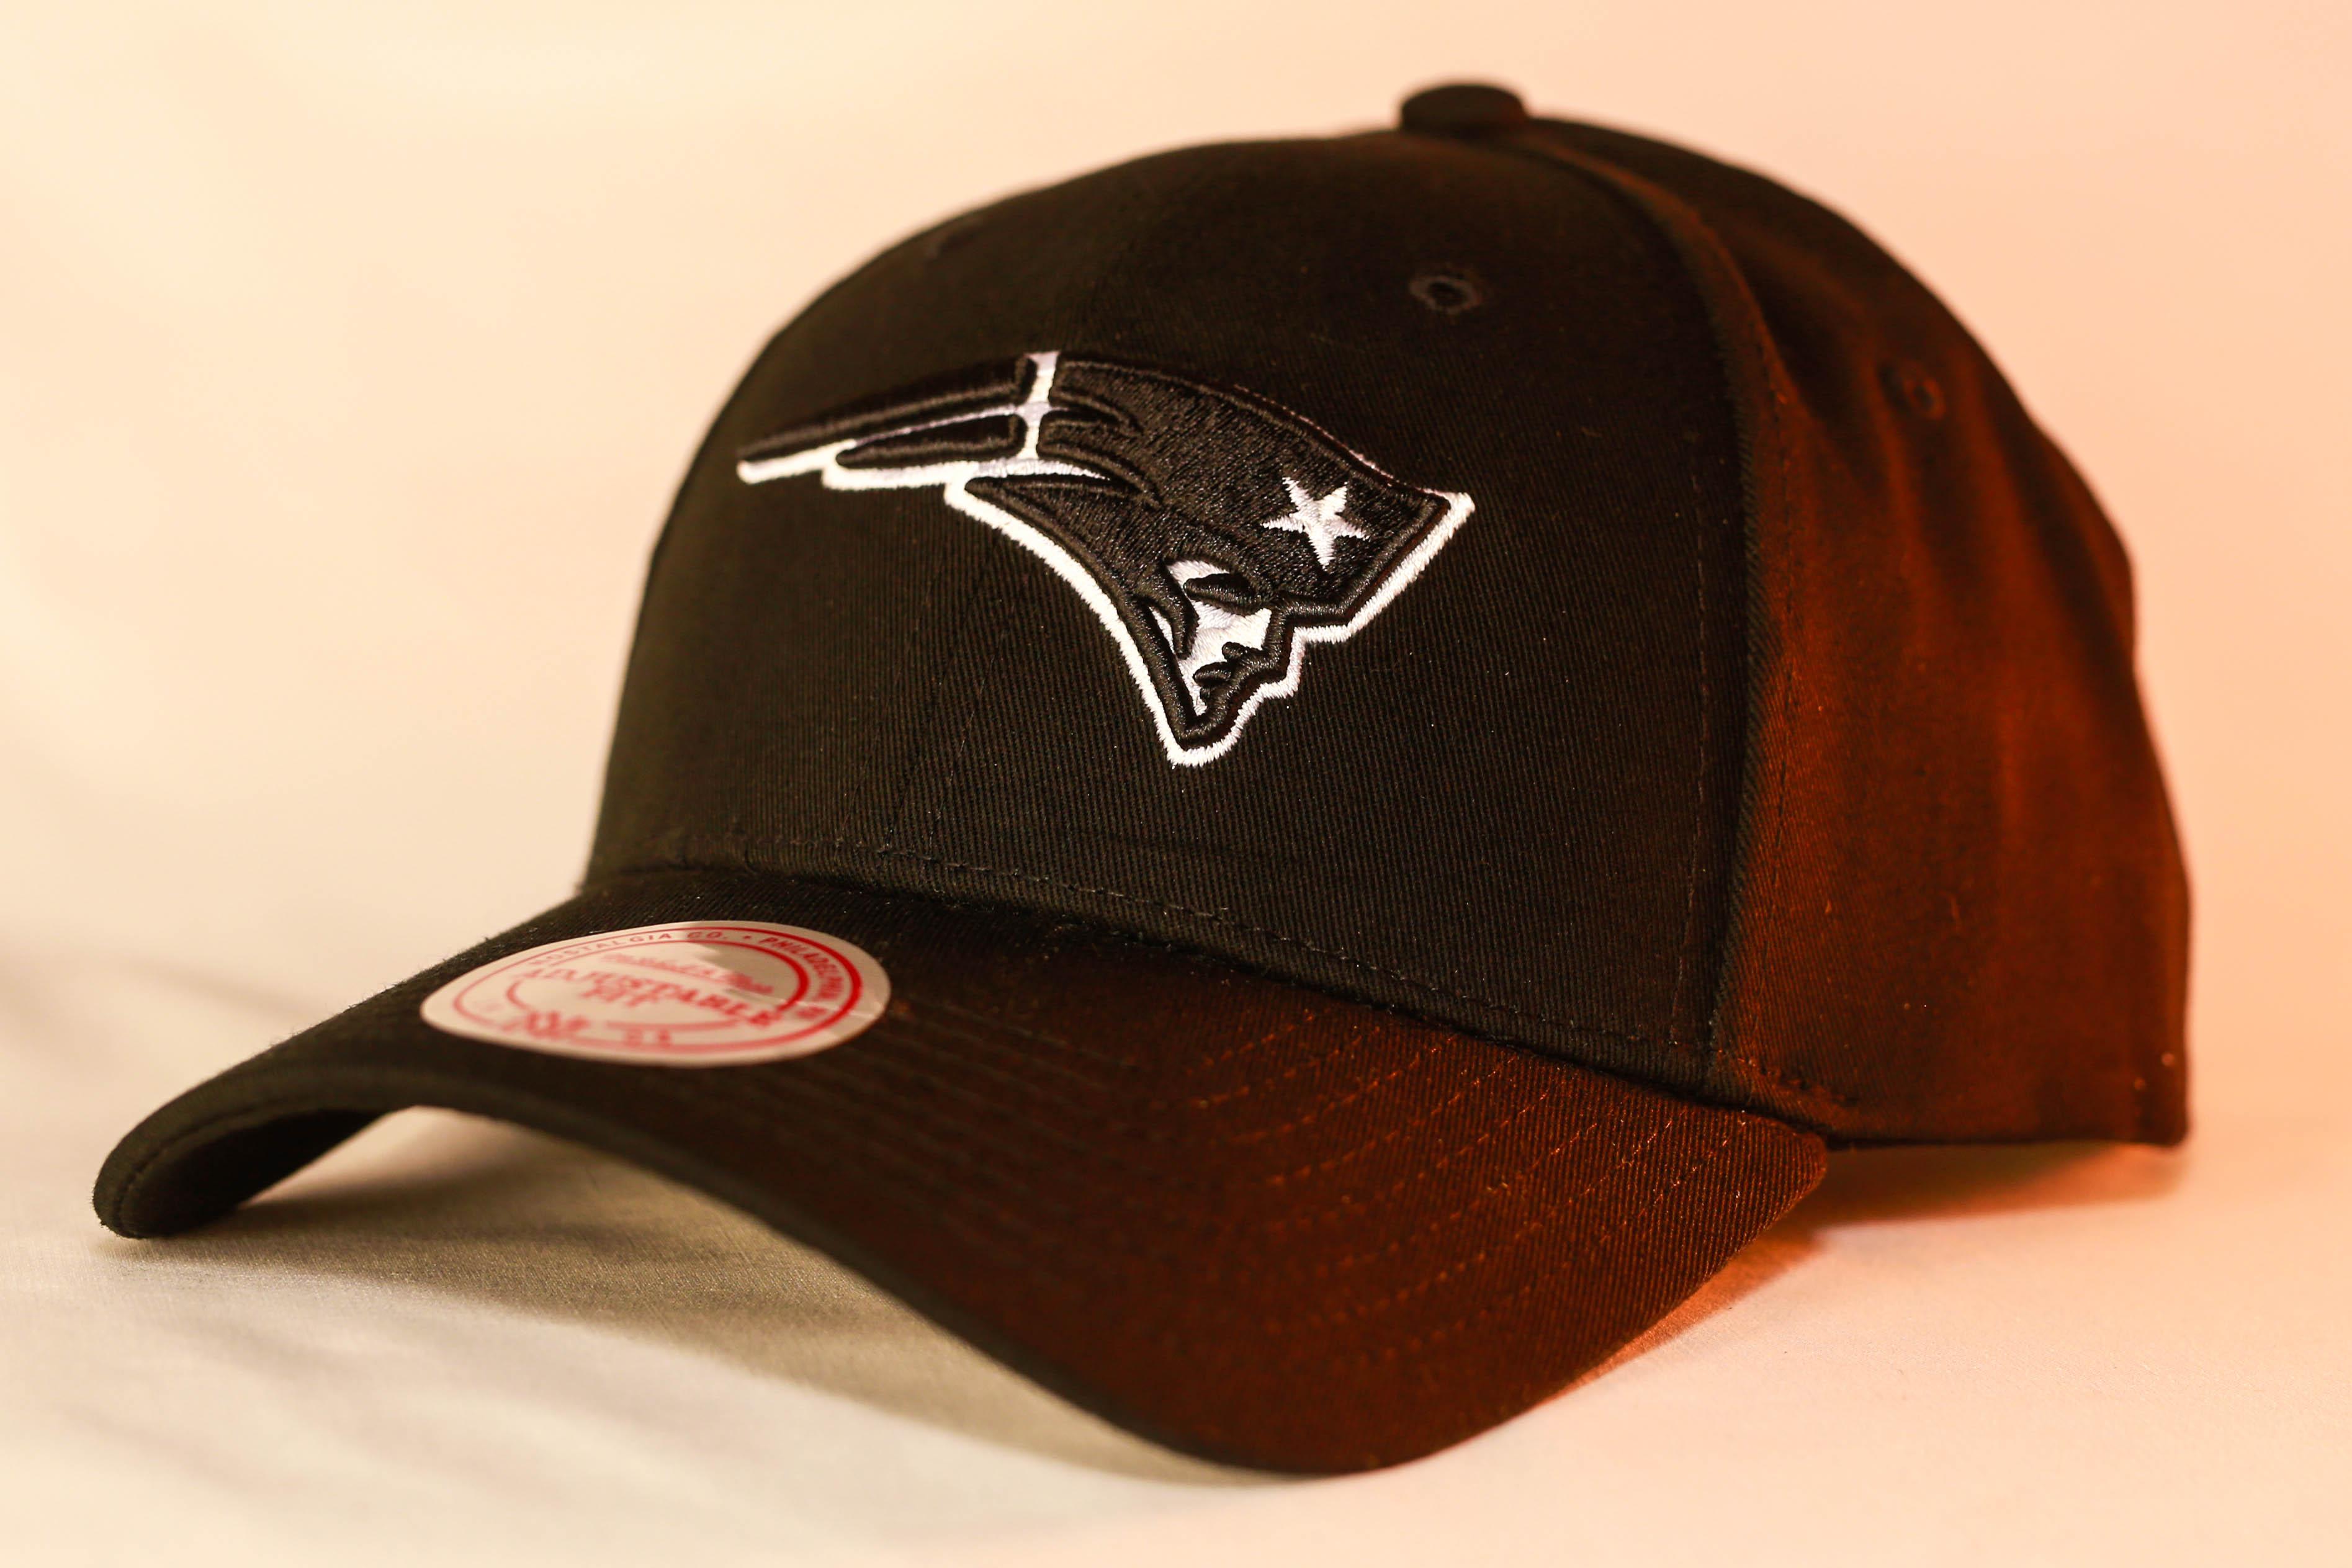 huge discount 581b2 8db9c Mitchell & Ness Logo Low Pro Snapback Black & White New England Patriots  Men's & Women's